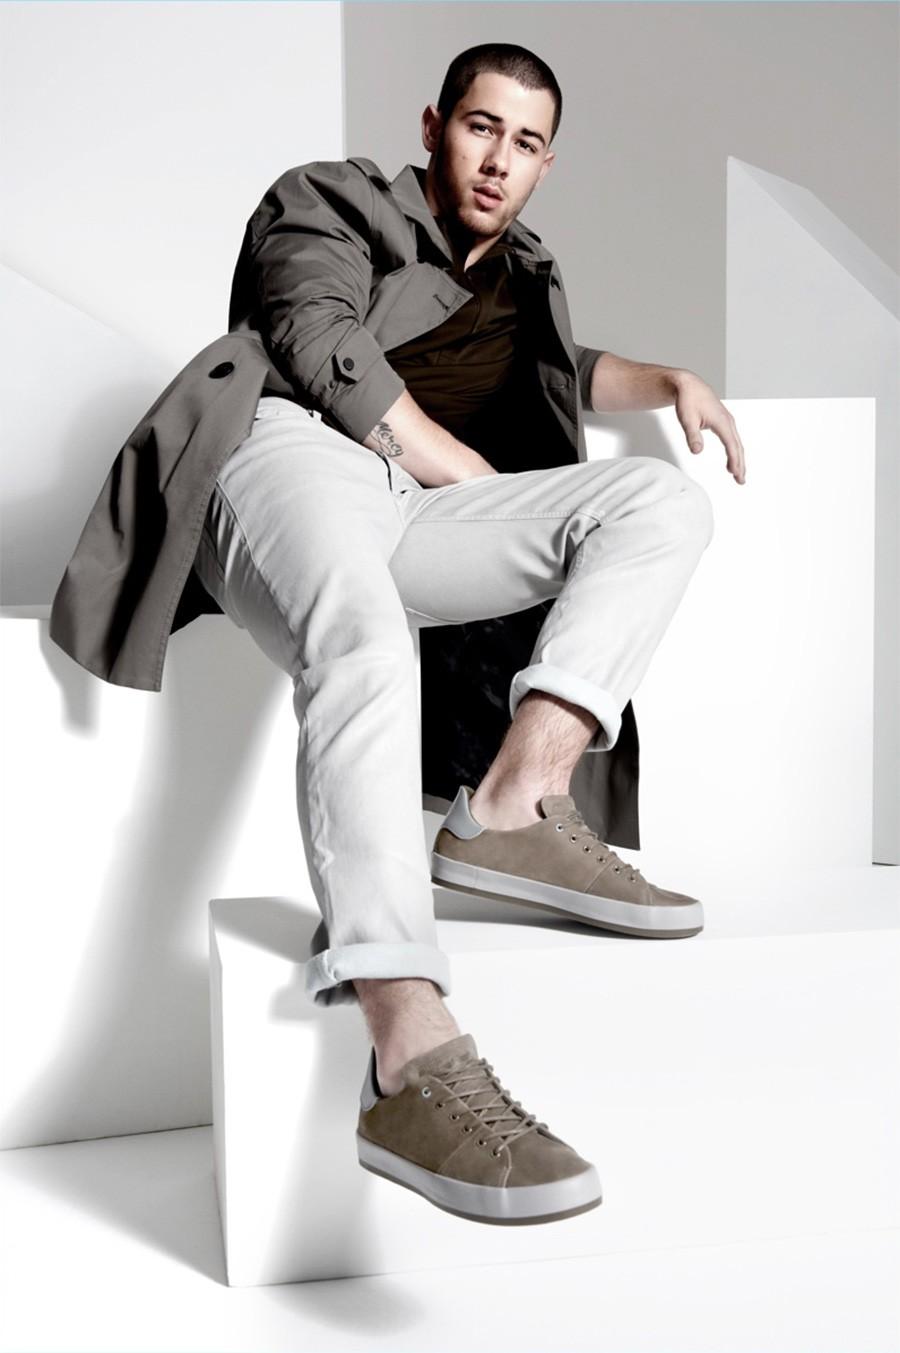 noticia nick jonas sneakers creative recreation tendencias moda lifestyle umomag